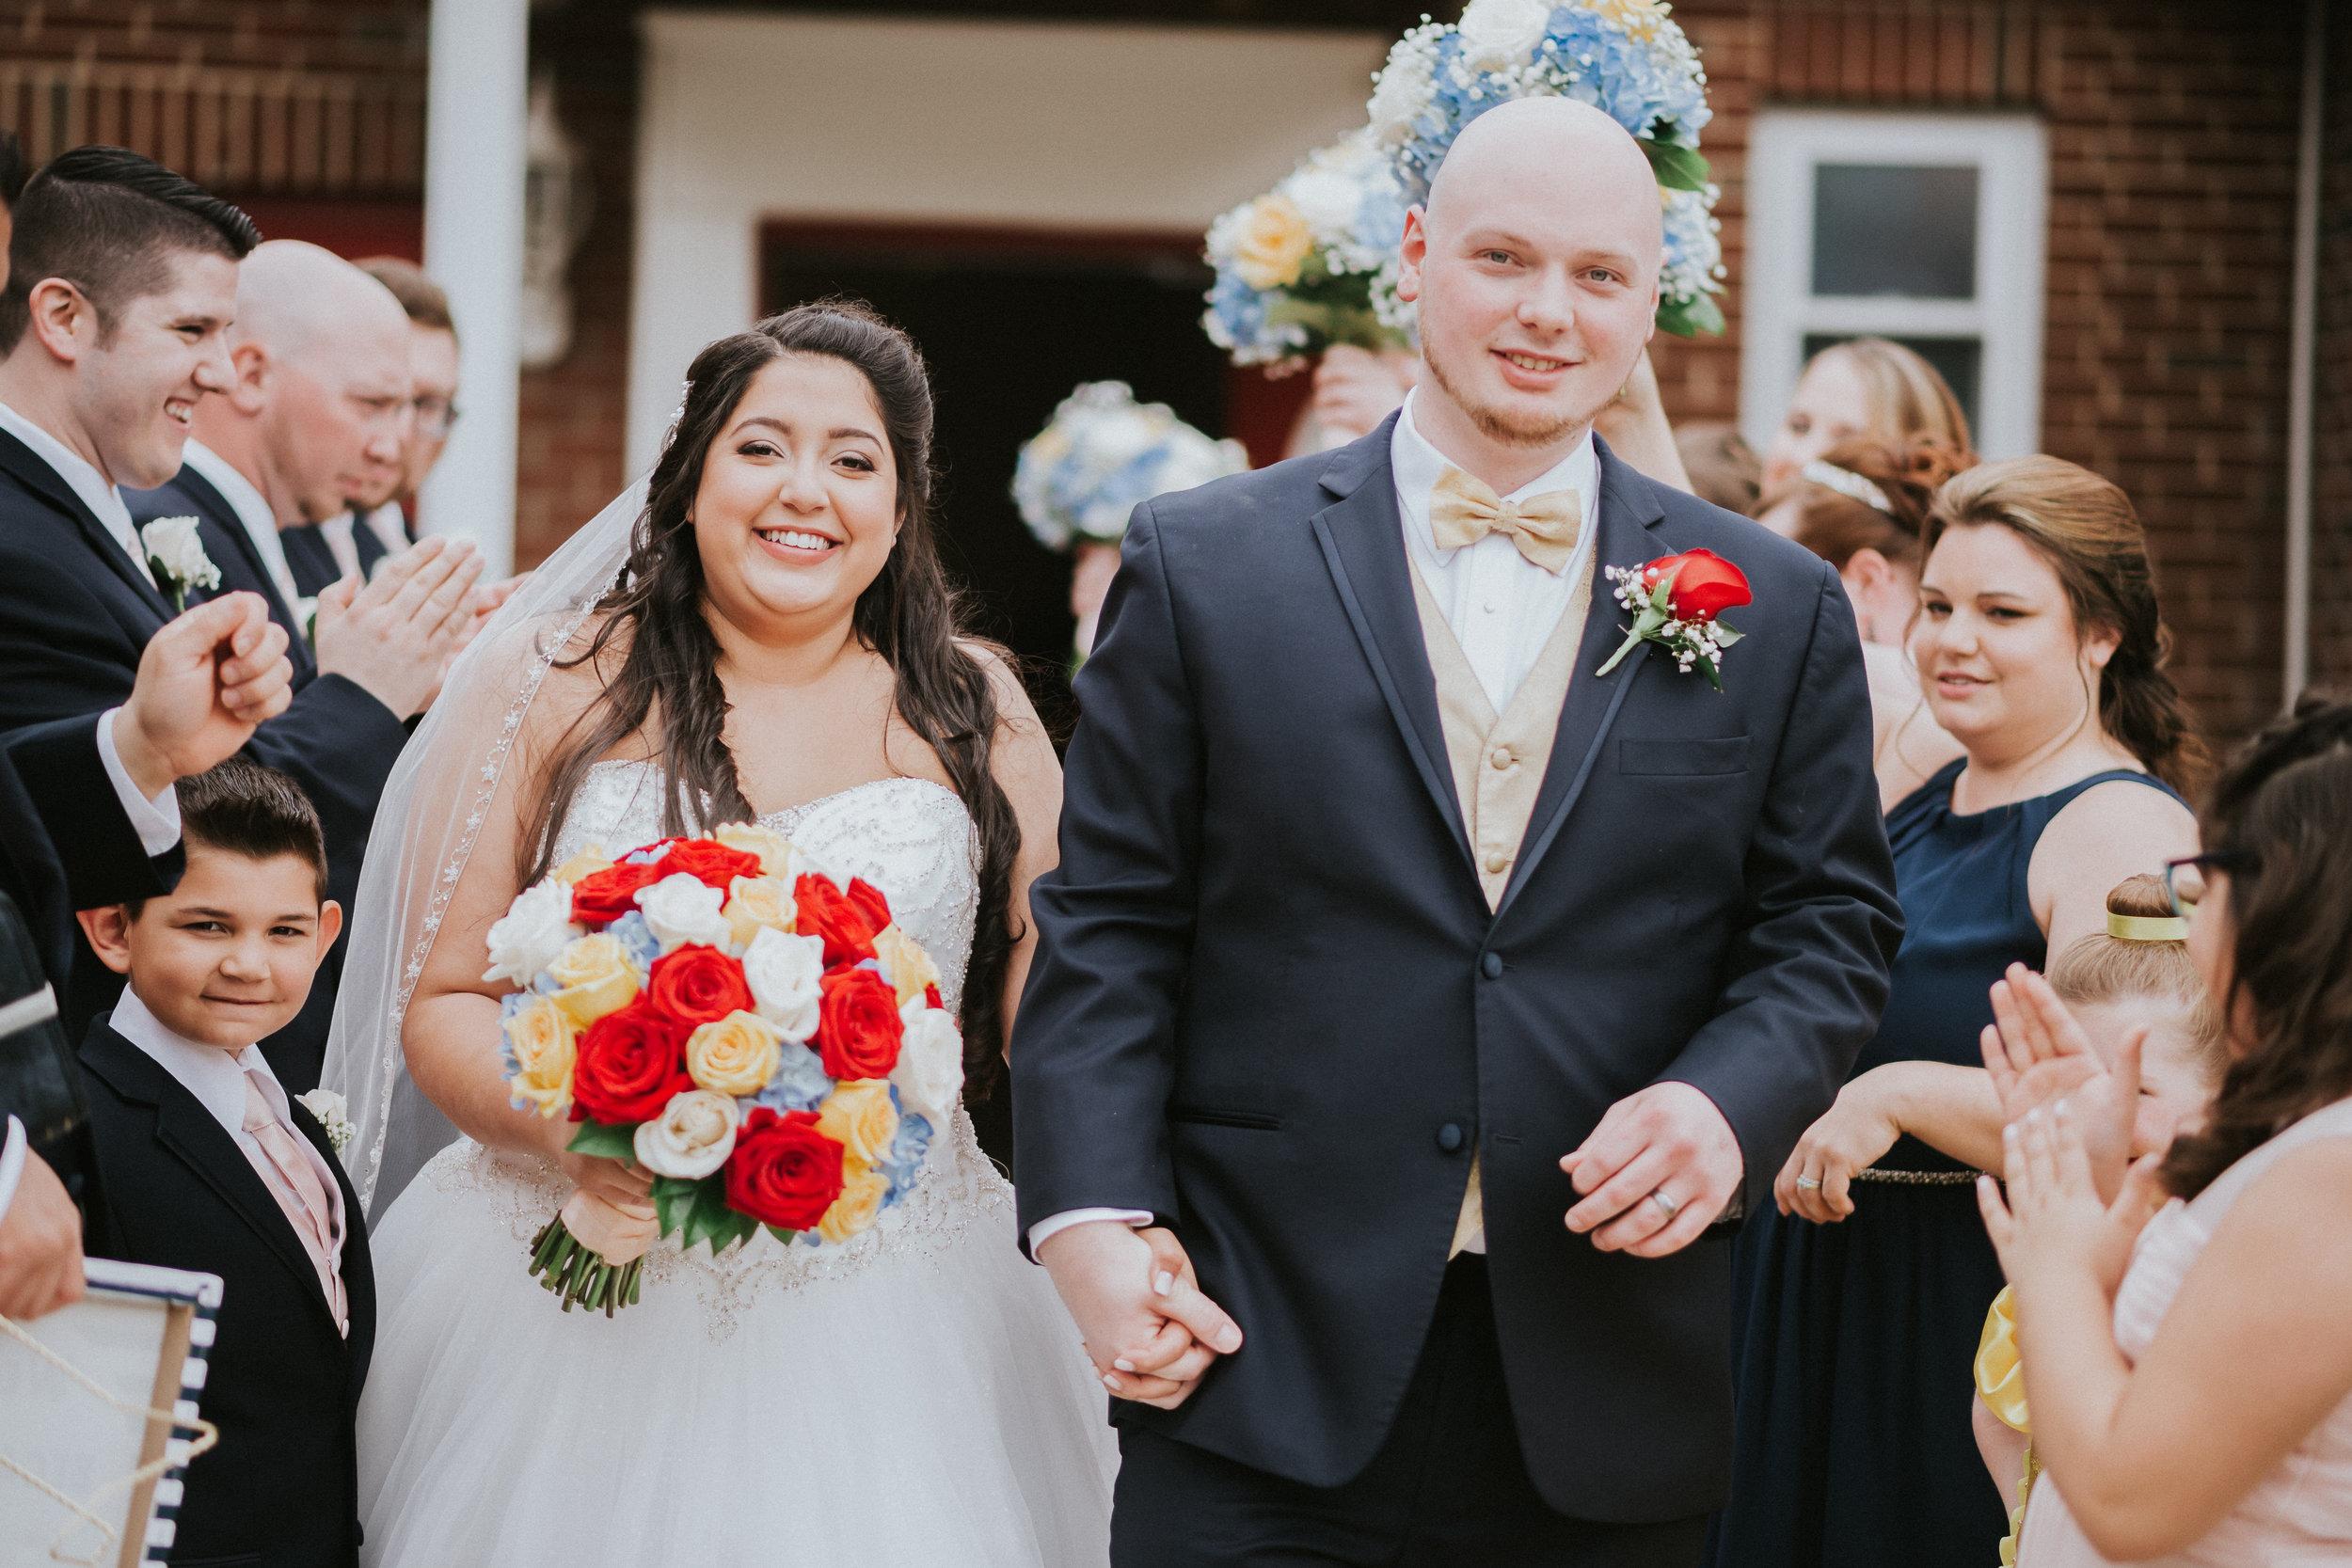 Barclay-Farmstead-Wedding-Rosa-and-Mike-342.jpg